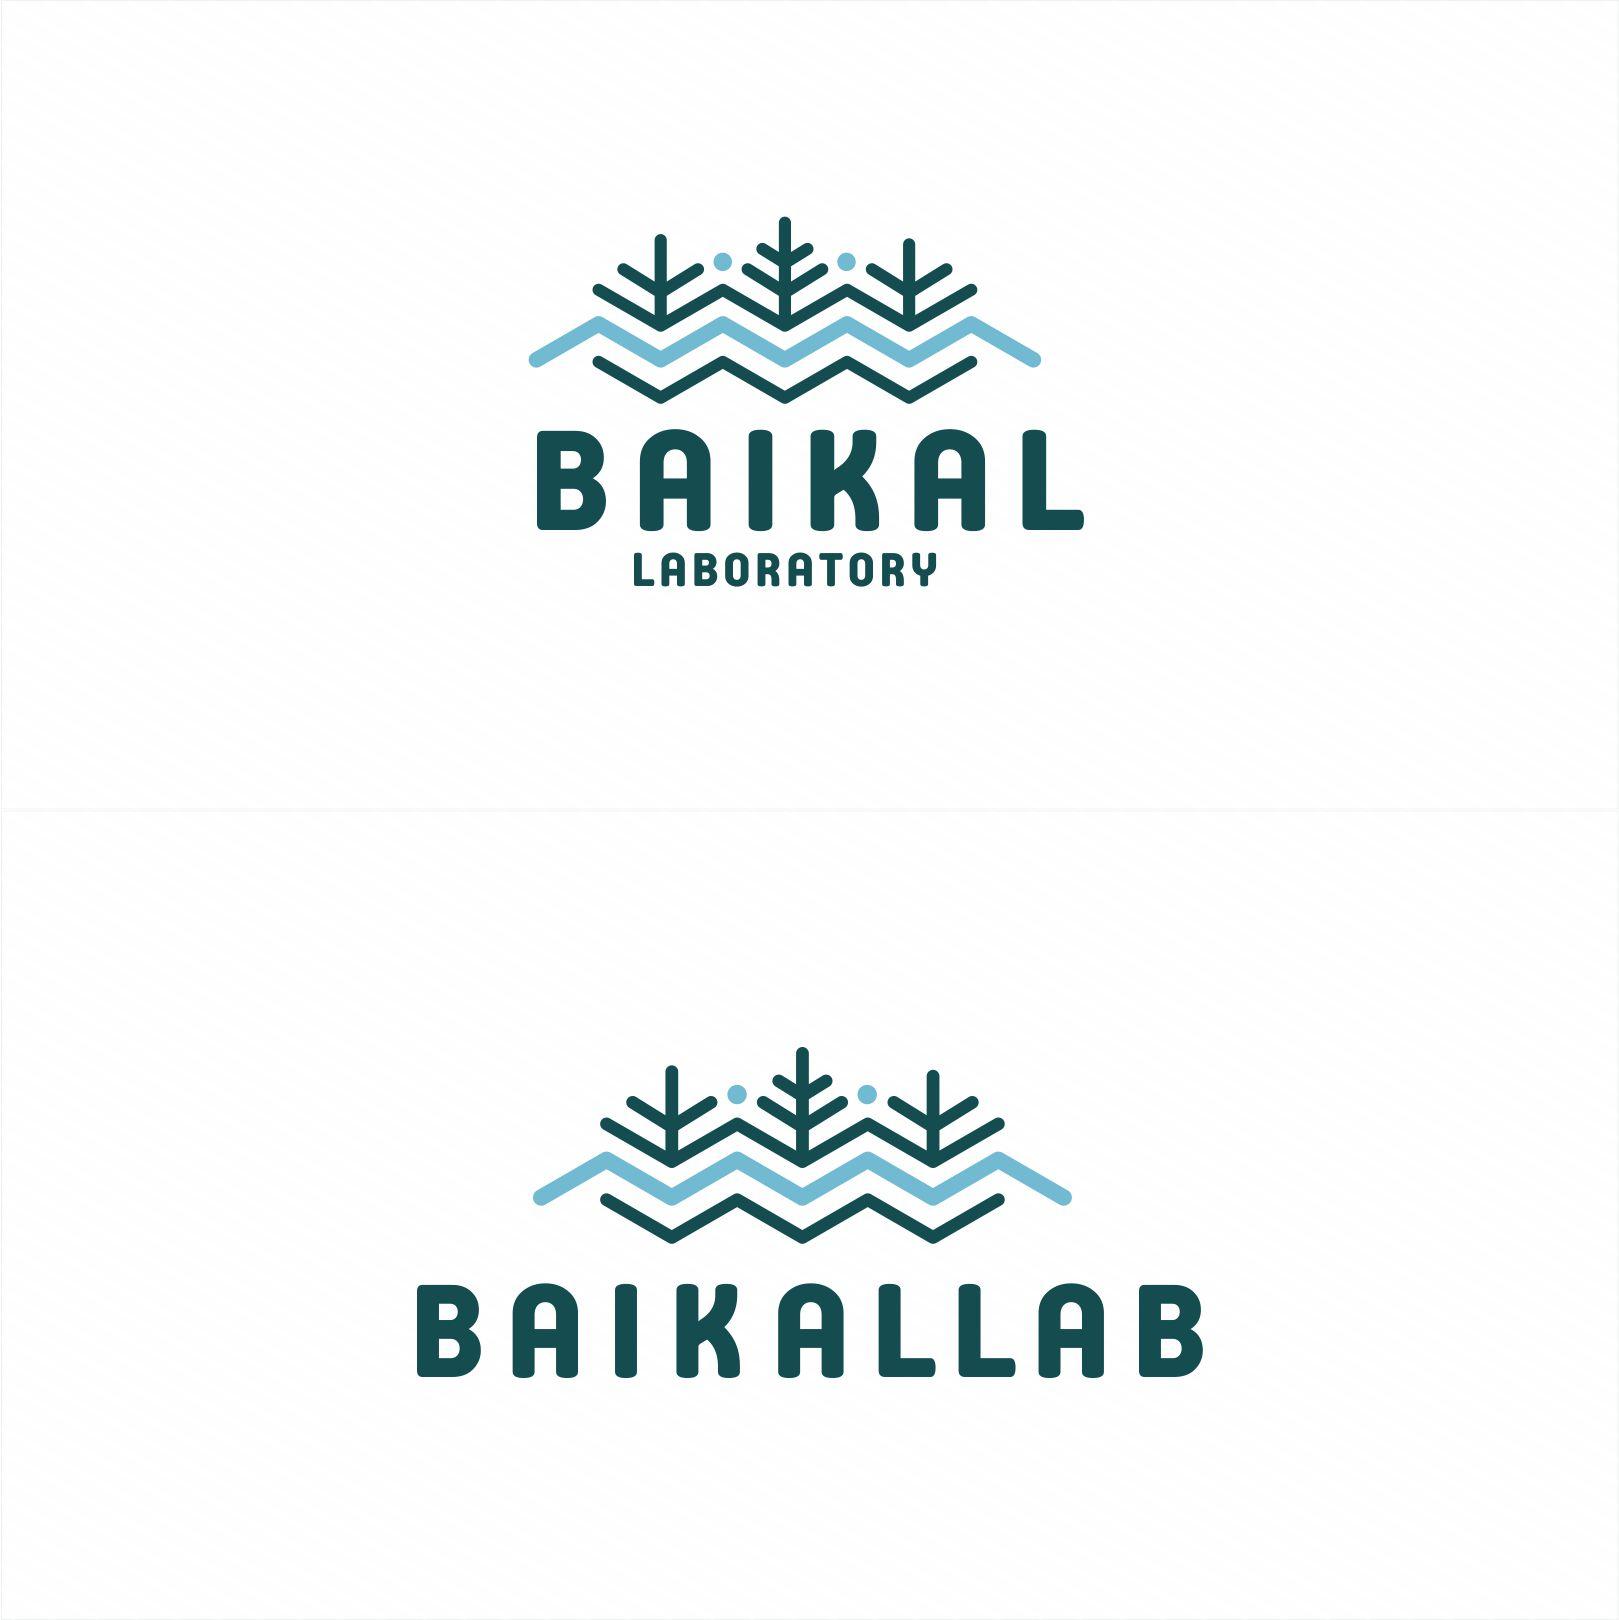 Разработка логотипа торговой марки фото f_30859709eba52168.jpg